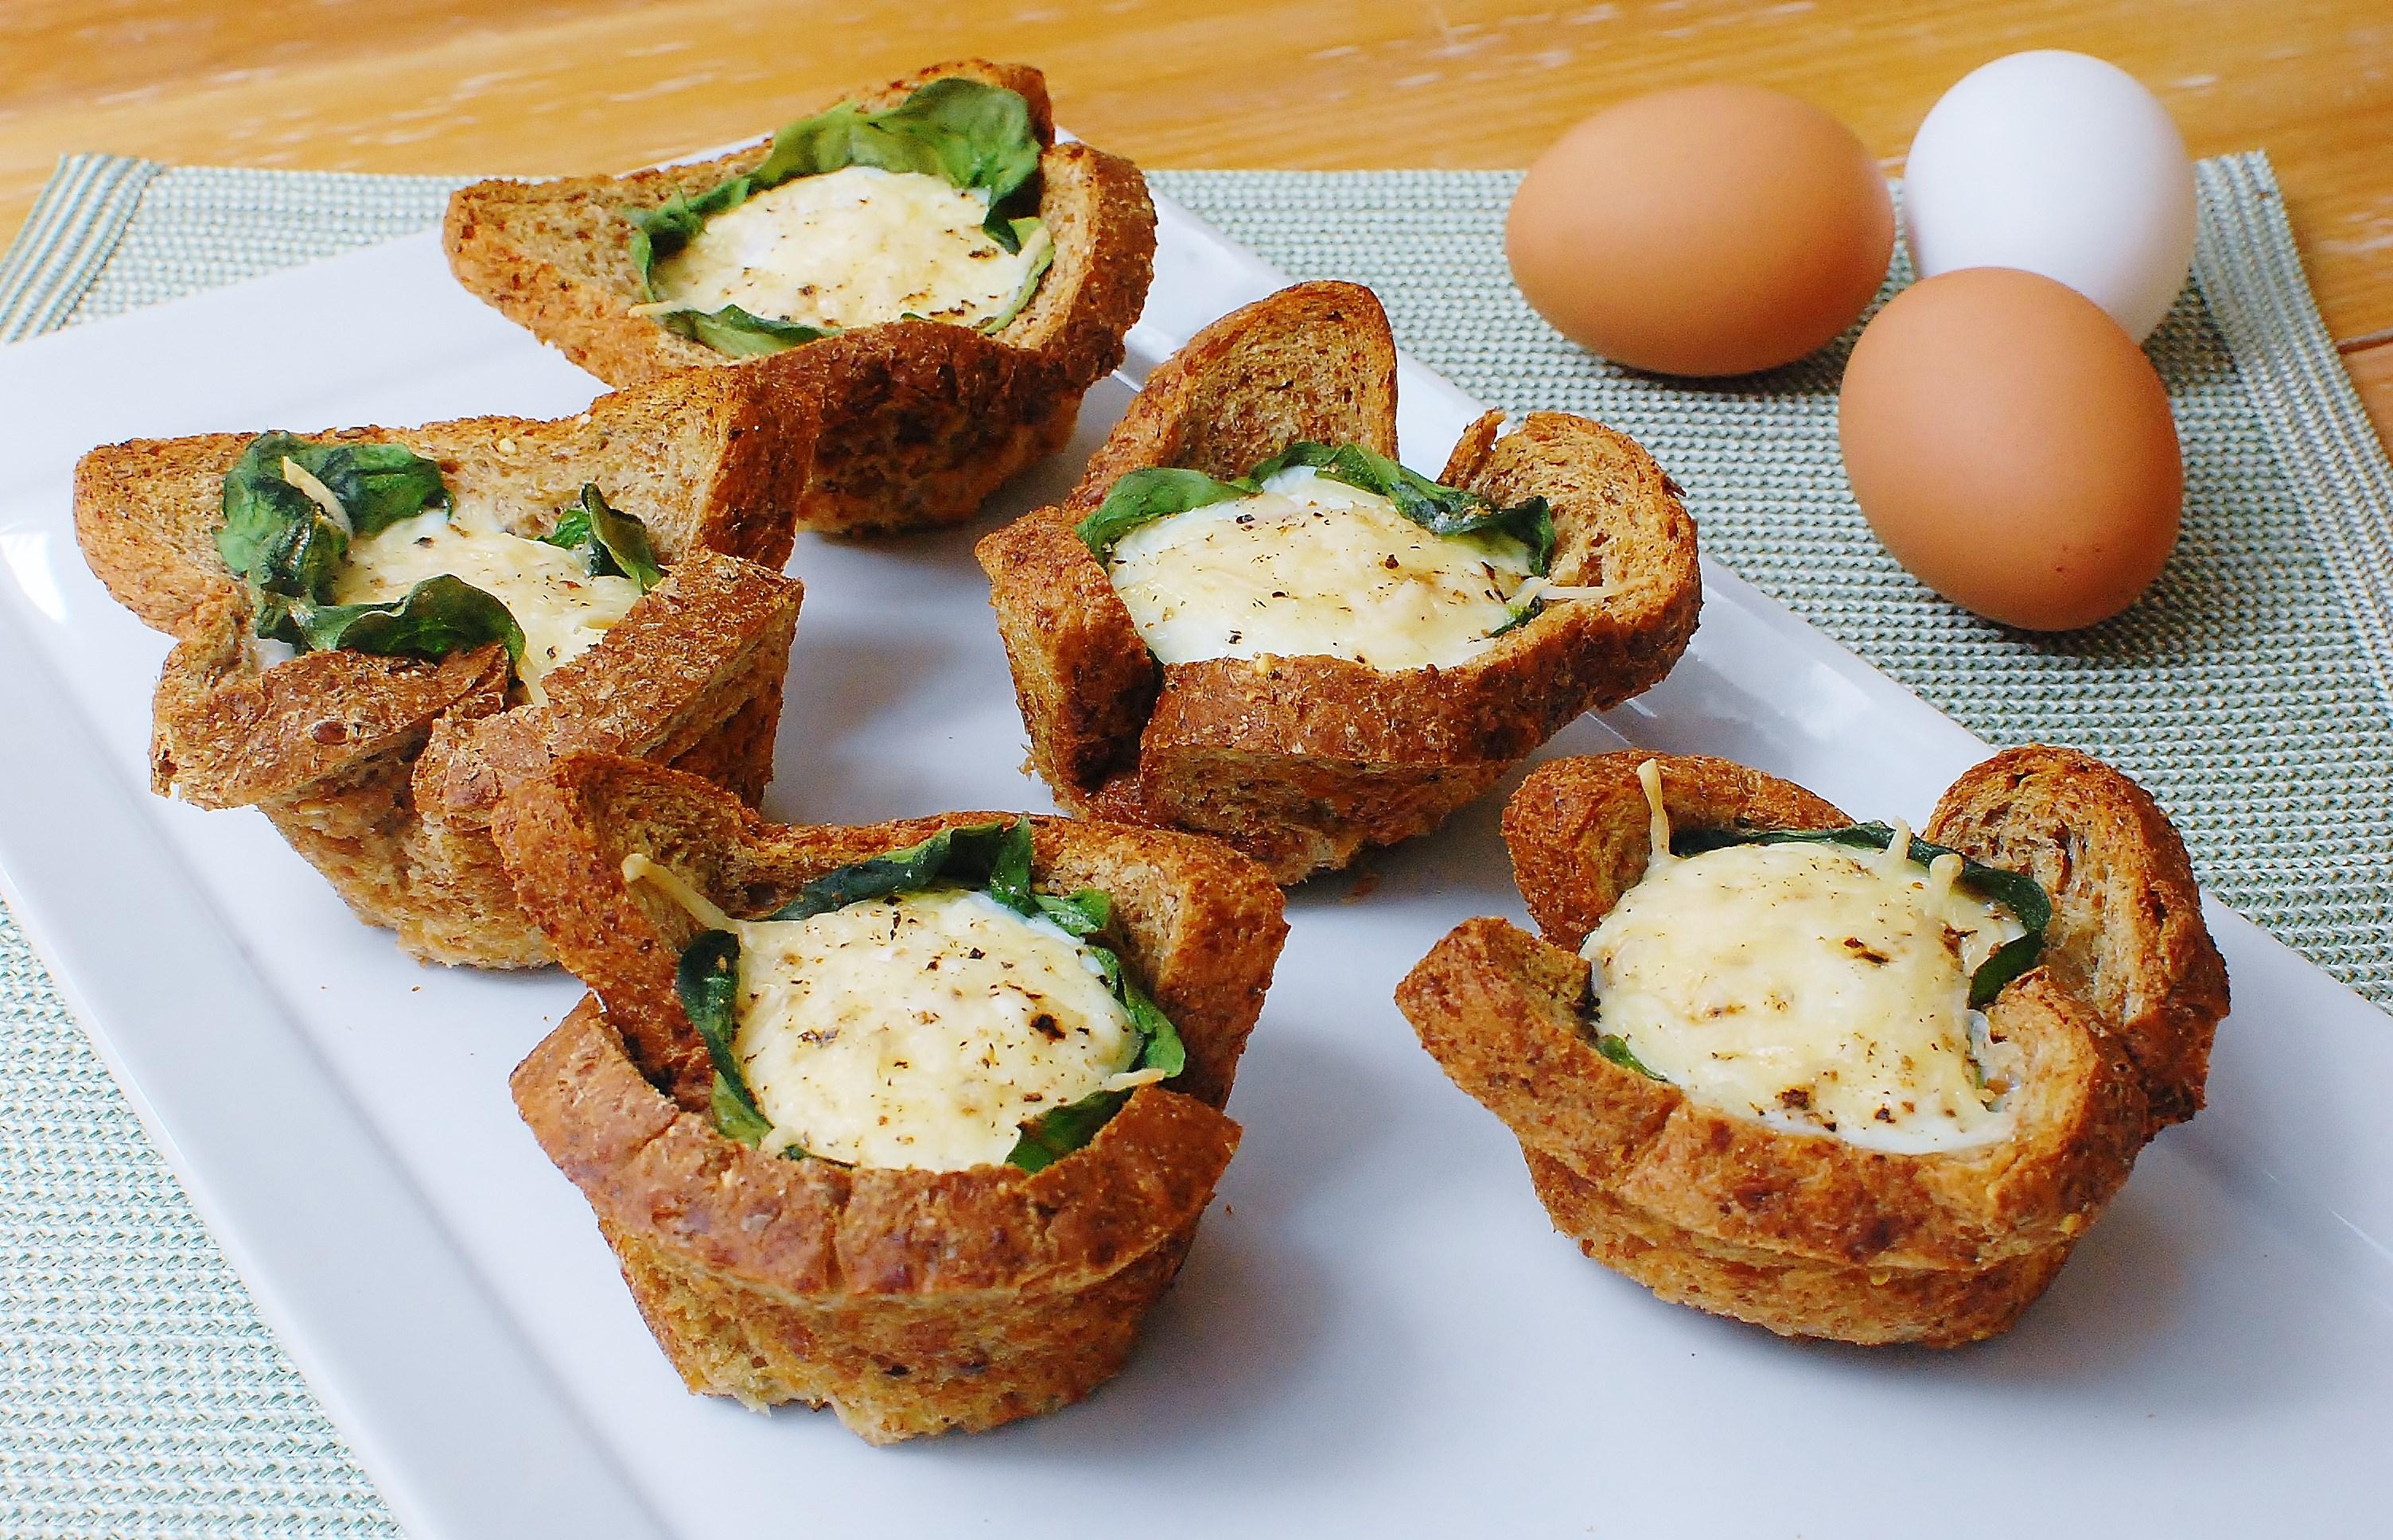 Florentine Toast 'n Egg Cups